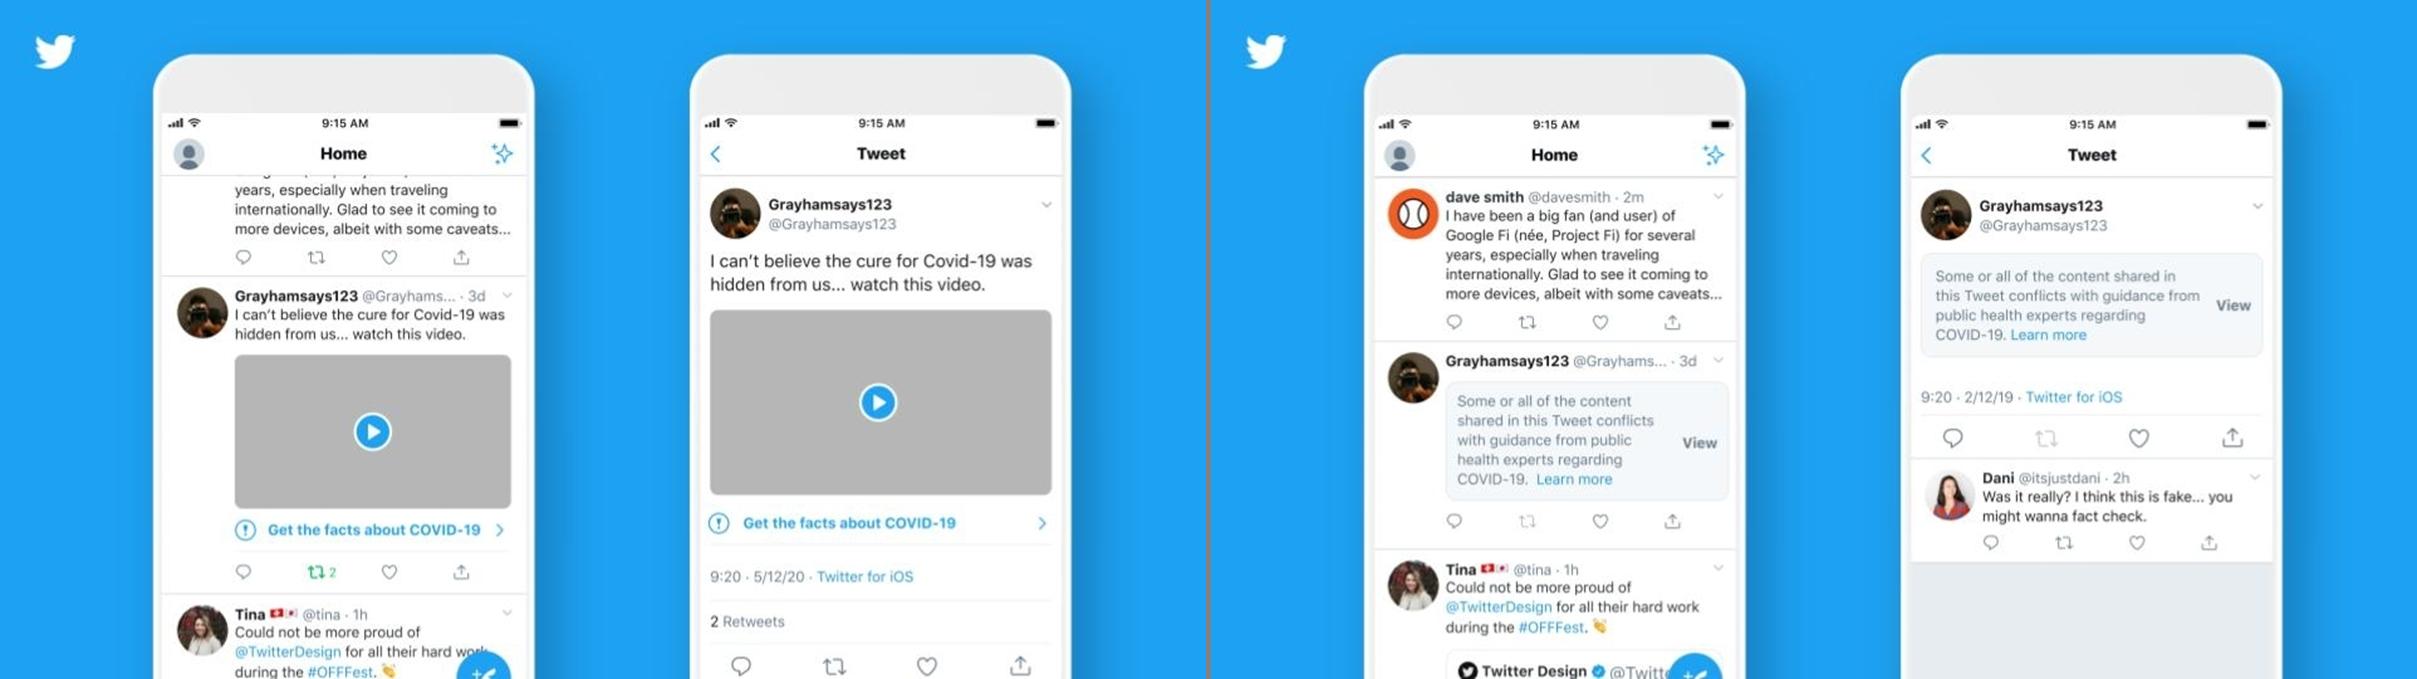 Twitter ラベルと警告メッセージの表示